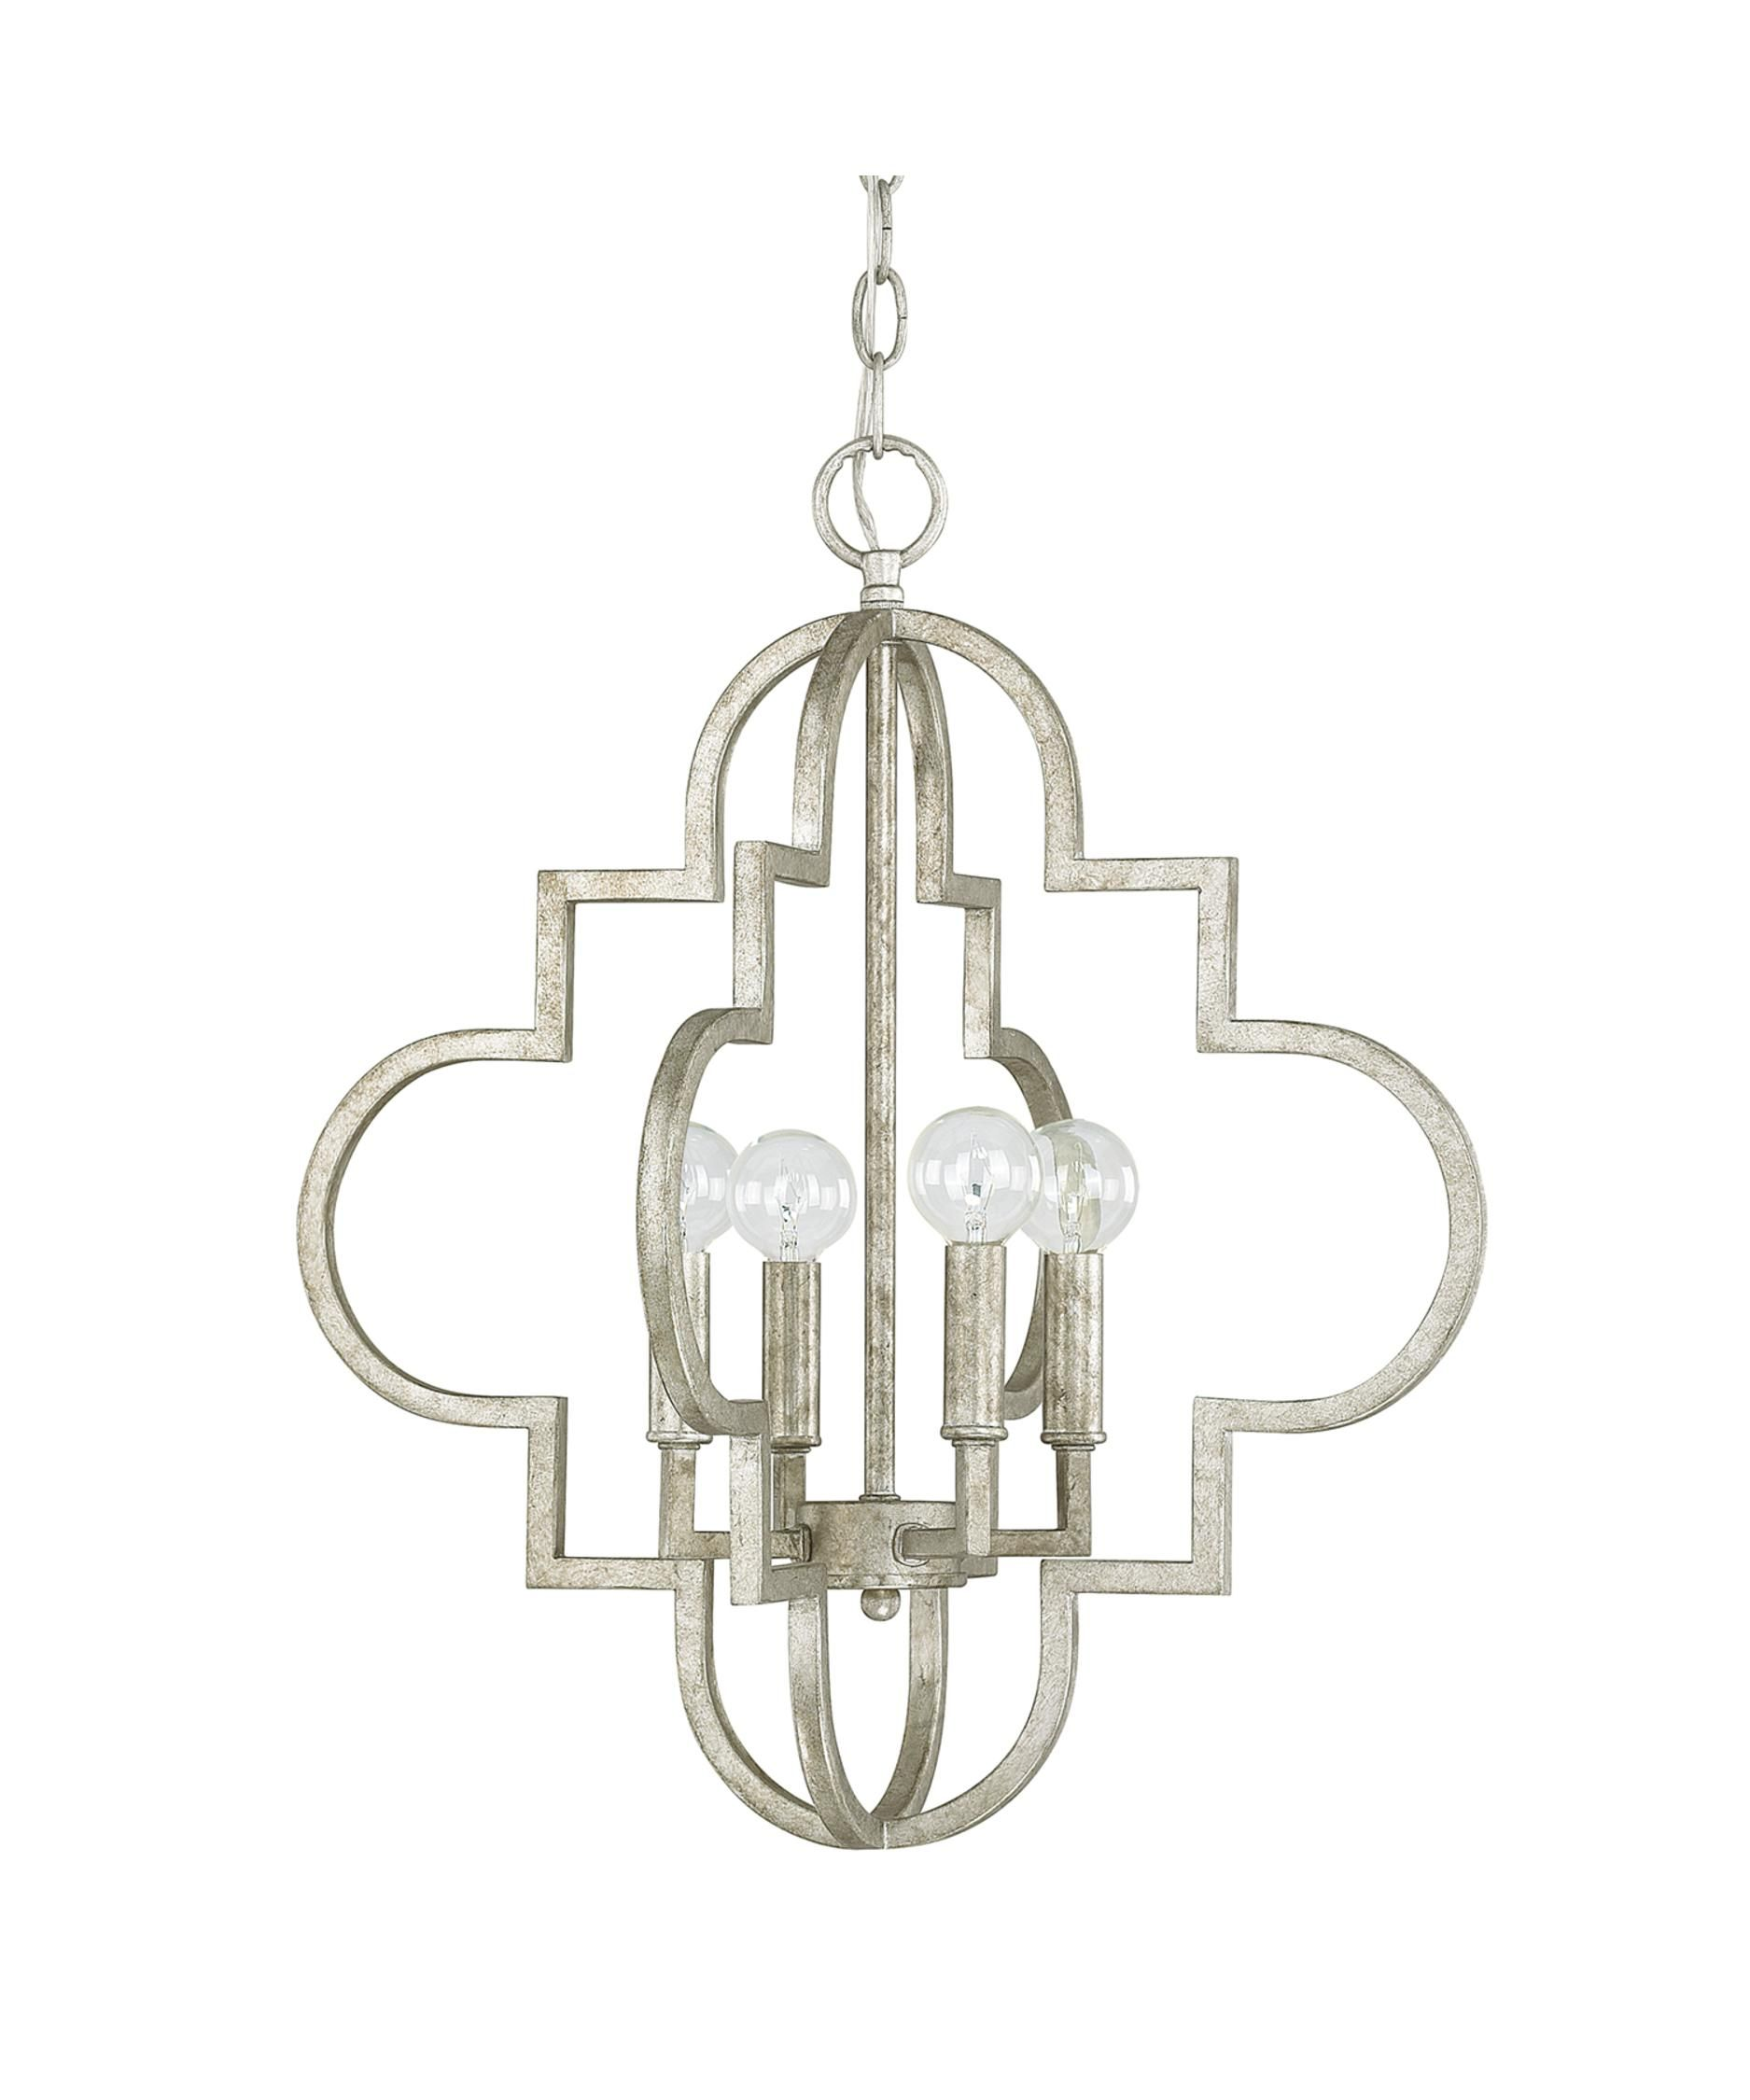 Capital lighting ellis 18 inch wide 4 light chandelier chandeliers capital lighting 4541 ellis 18 inch chandelier aloadofball Gallery